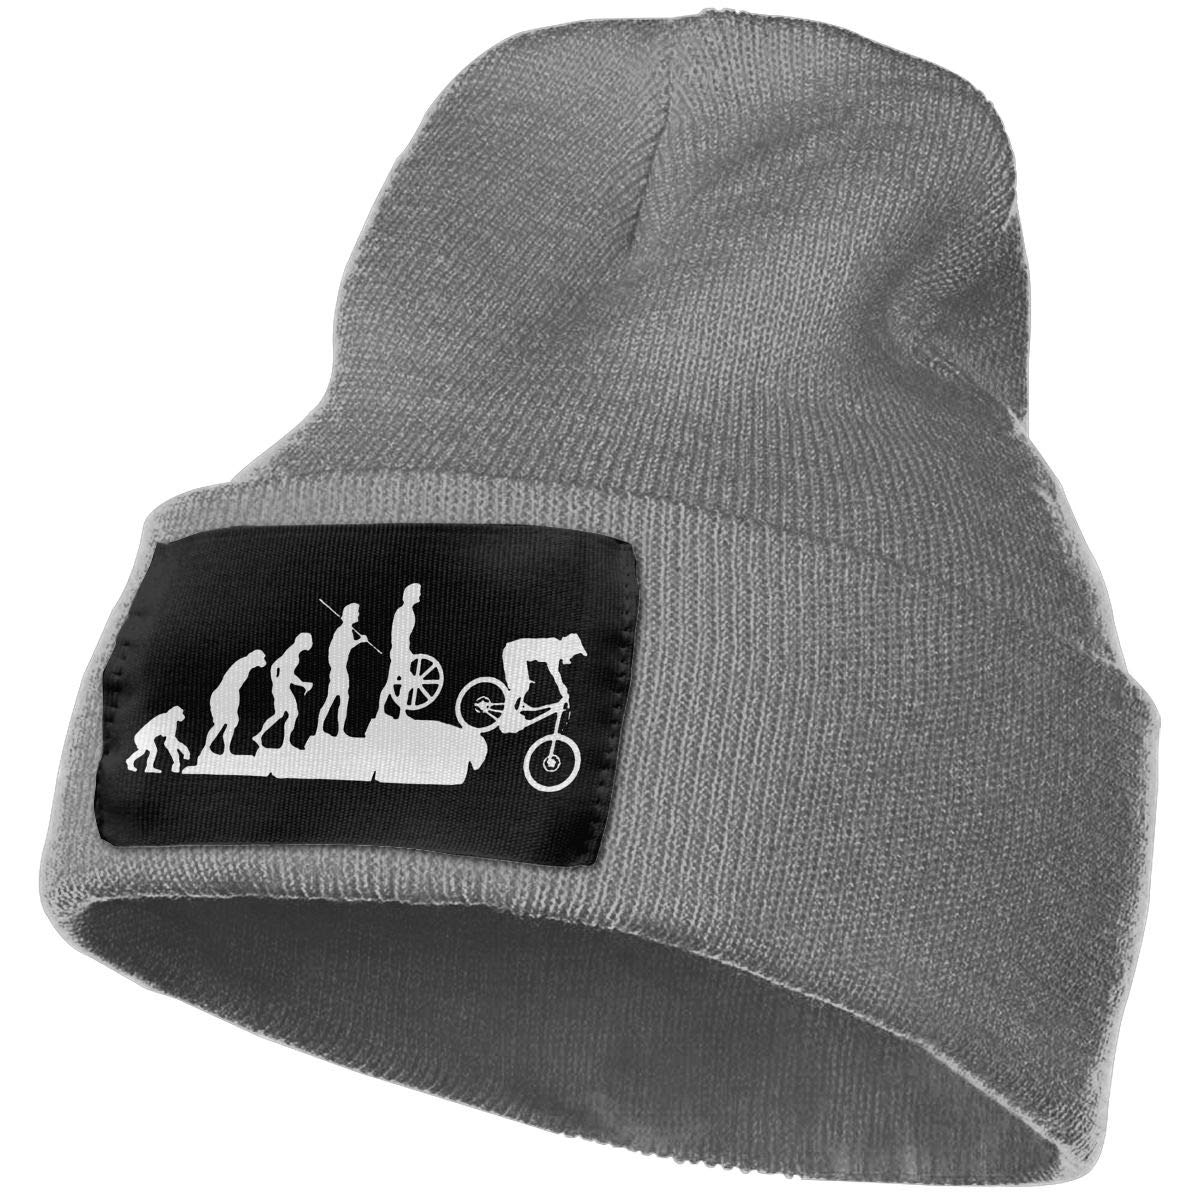 Mountain Bike Downhill Fashion Skull Cap WHOO93@Y Mens Womens 100/% Acrylic Knitting Hat Cap